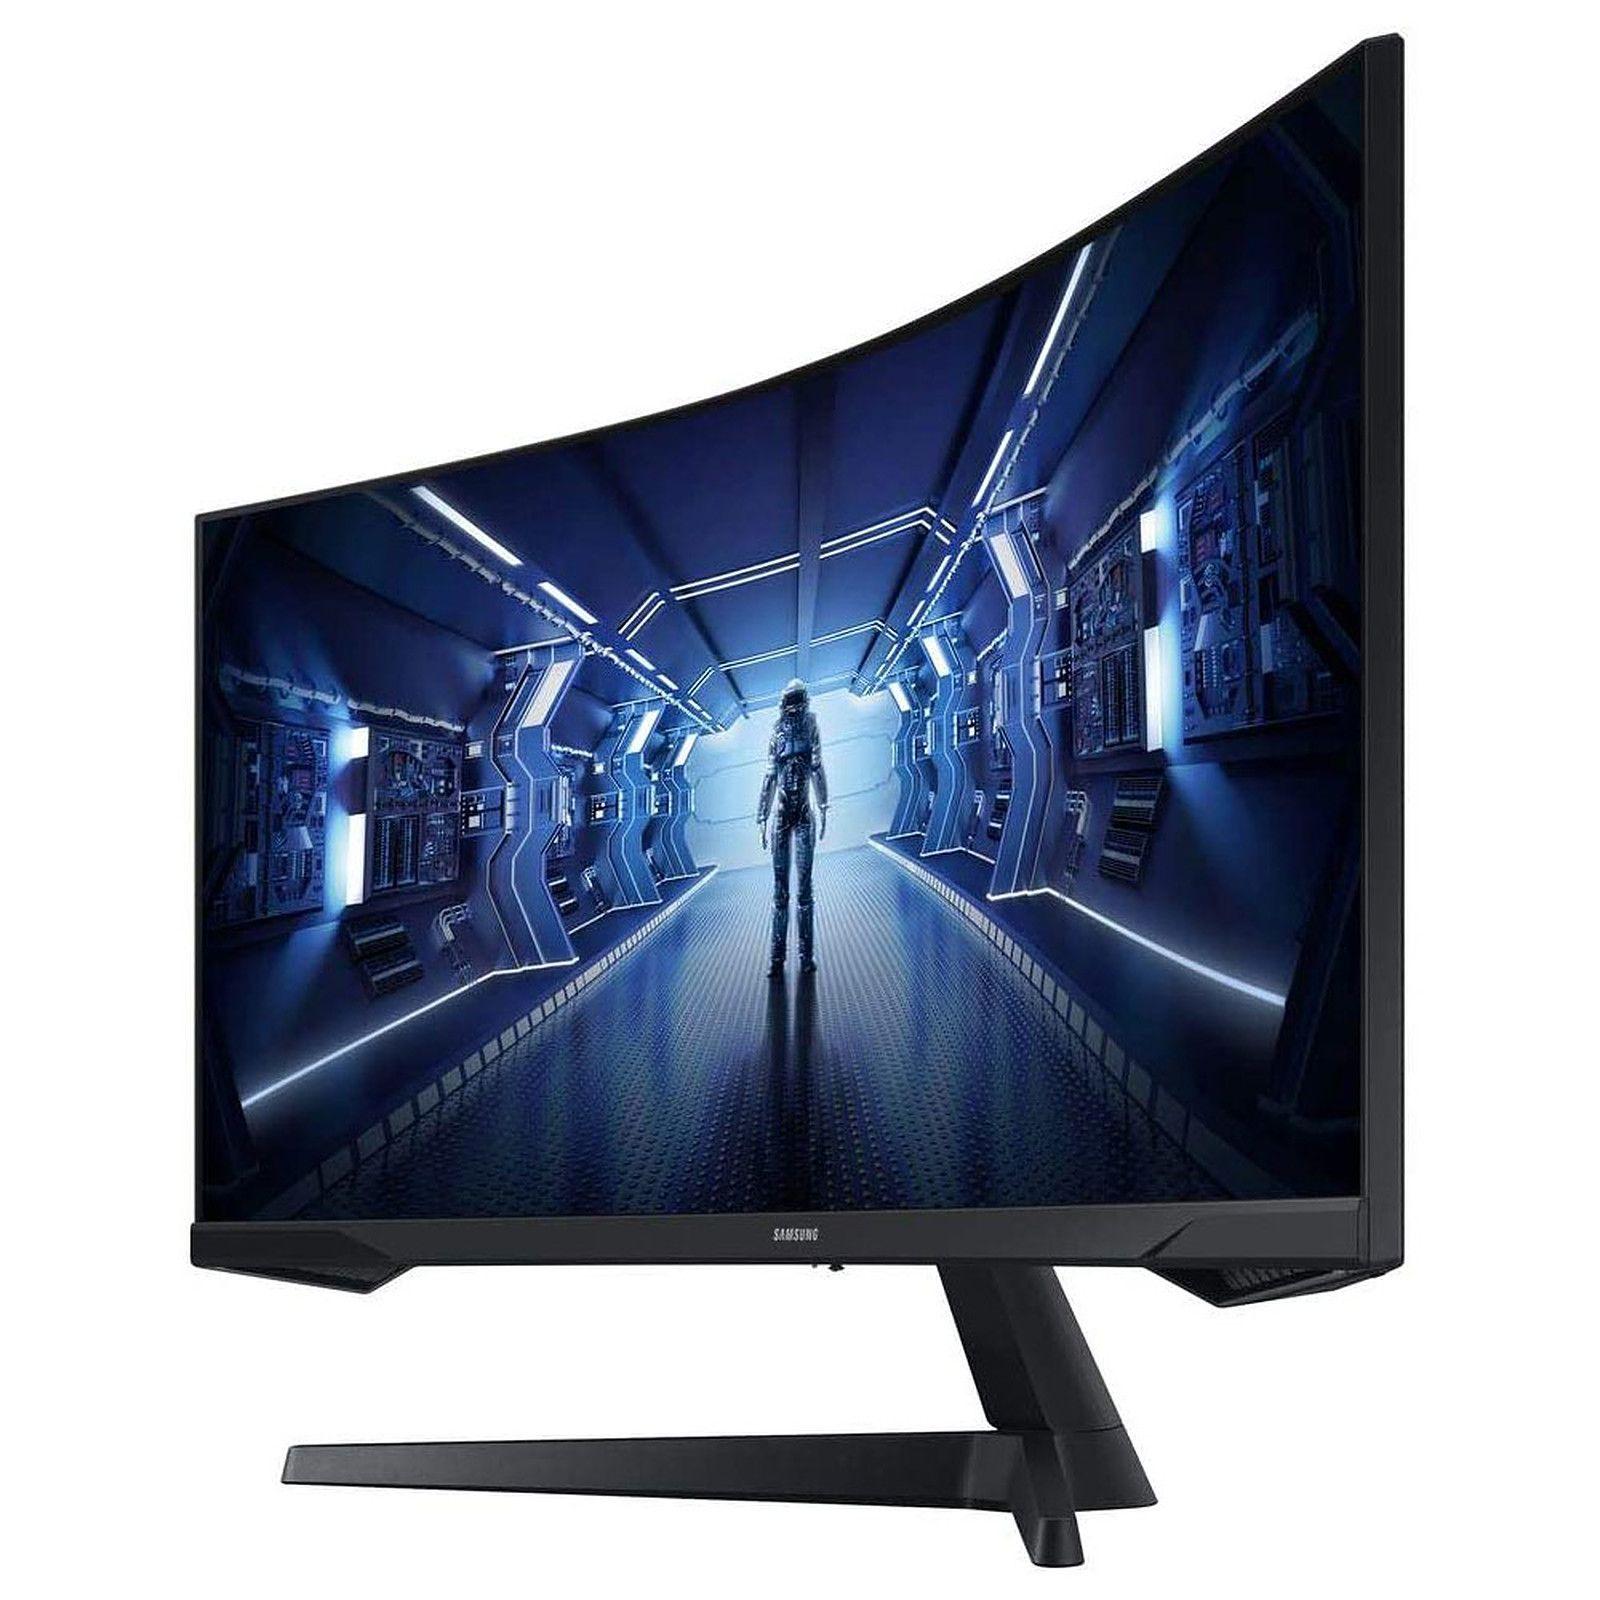 "Ecran PC incurvé 34"" Samsung Odyssey G5 LC34G55TWWRXEN - UWQHD, 165 Hz, Dalle VA, 1 ms"